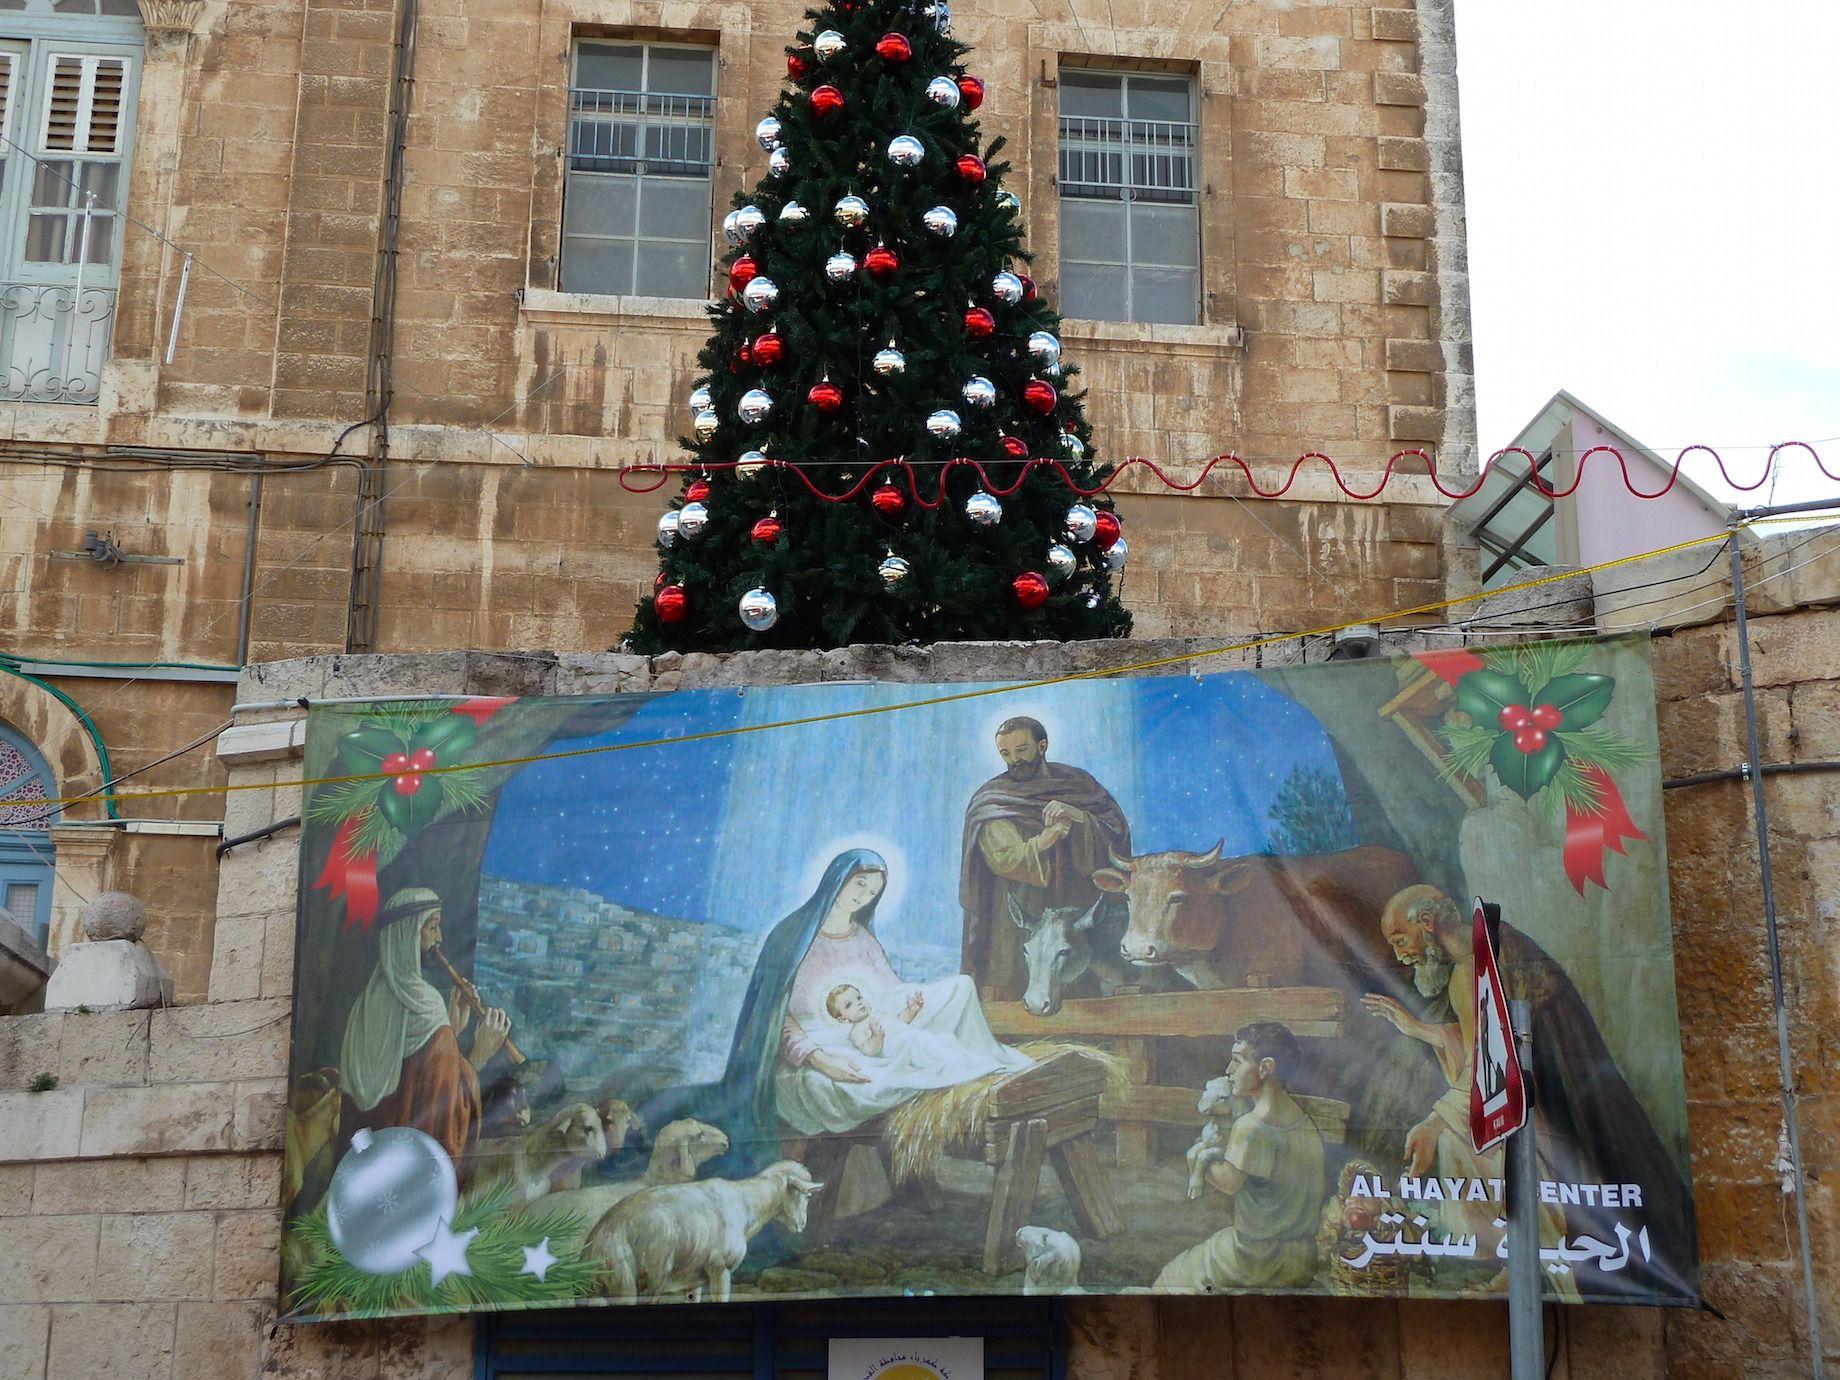 Christmas Trees in Jerusalem Hotel Lobbies Break Jewish Law, Say ...